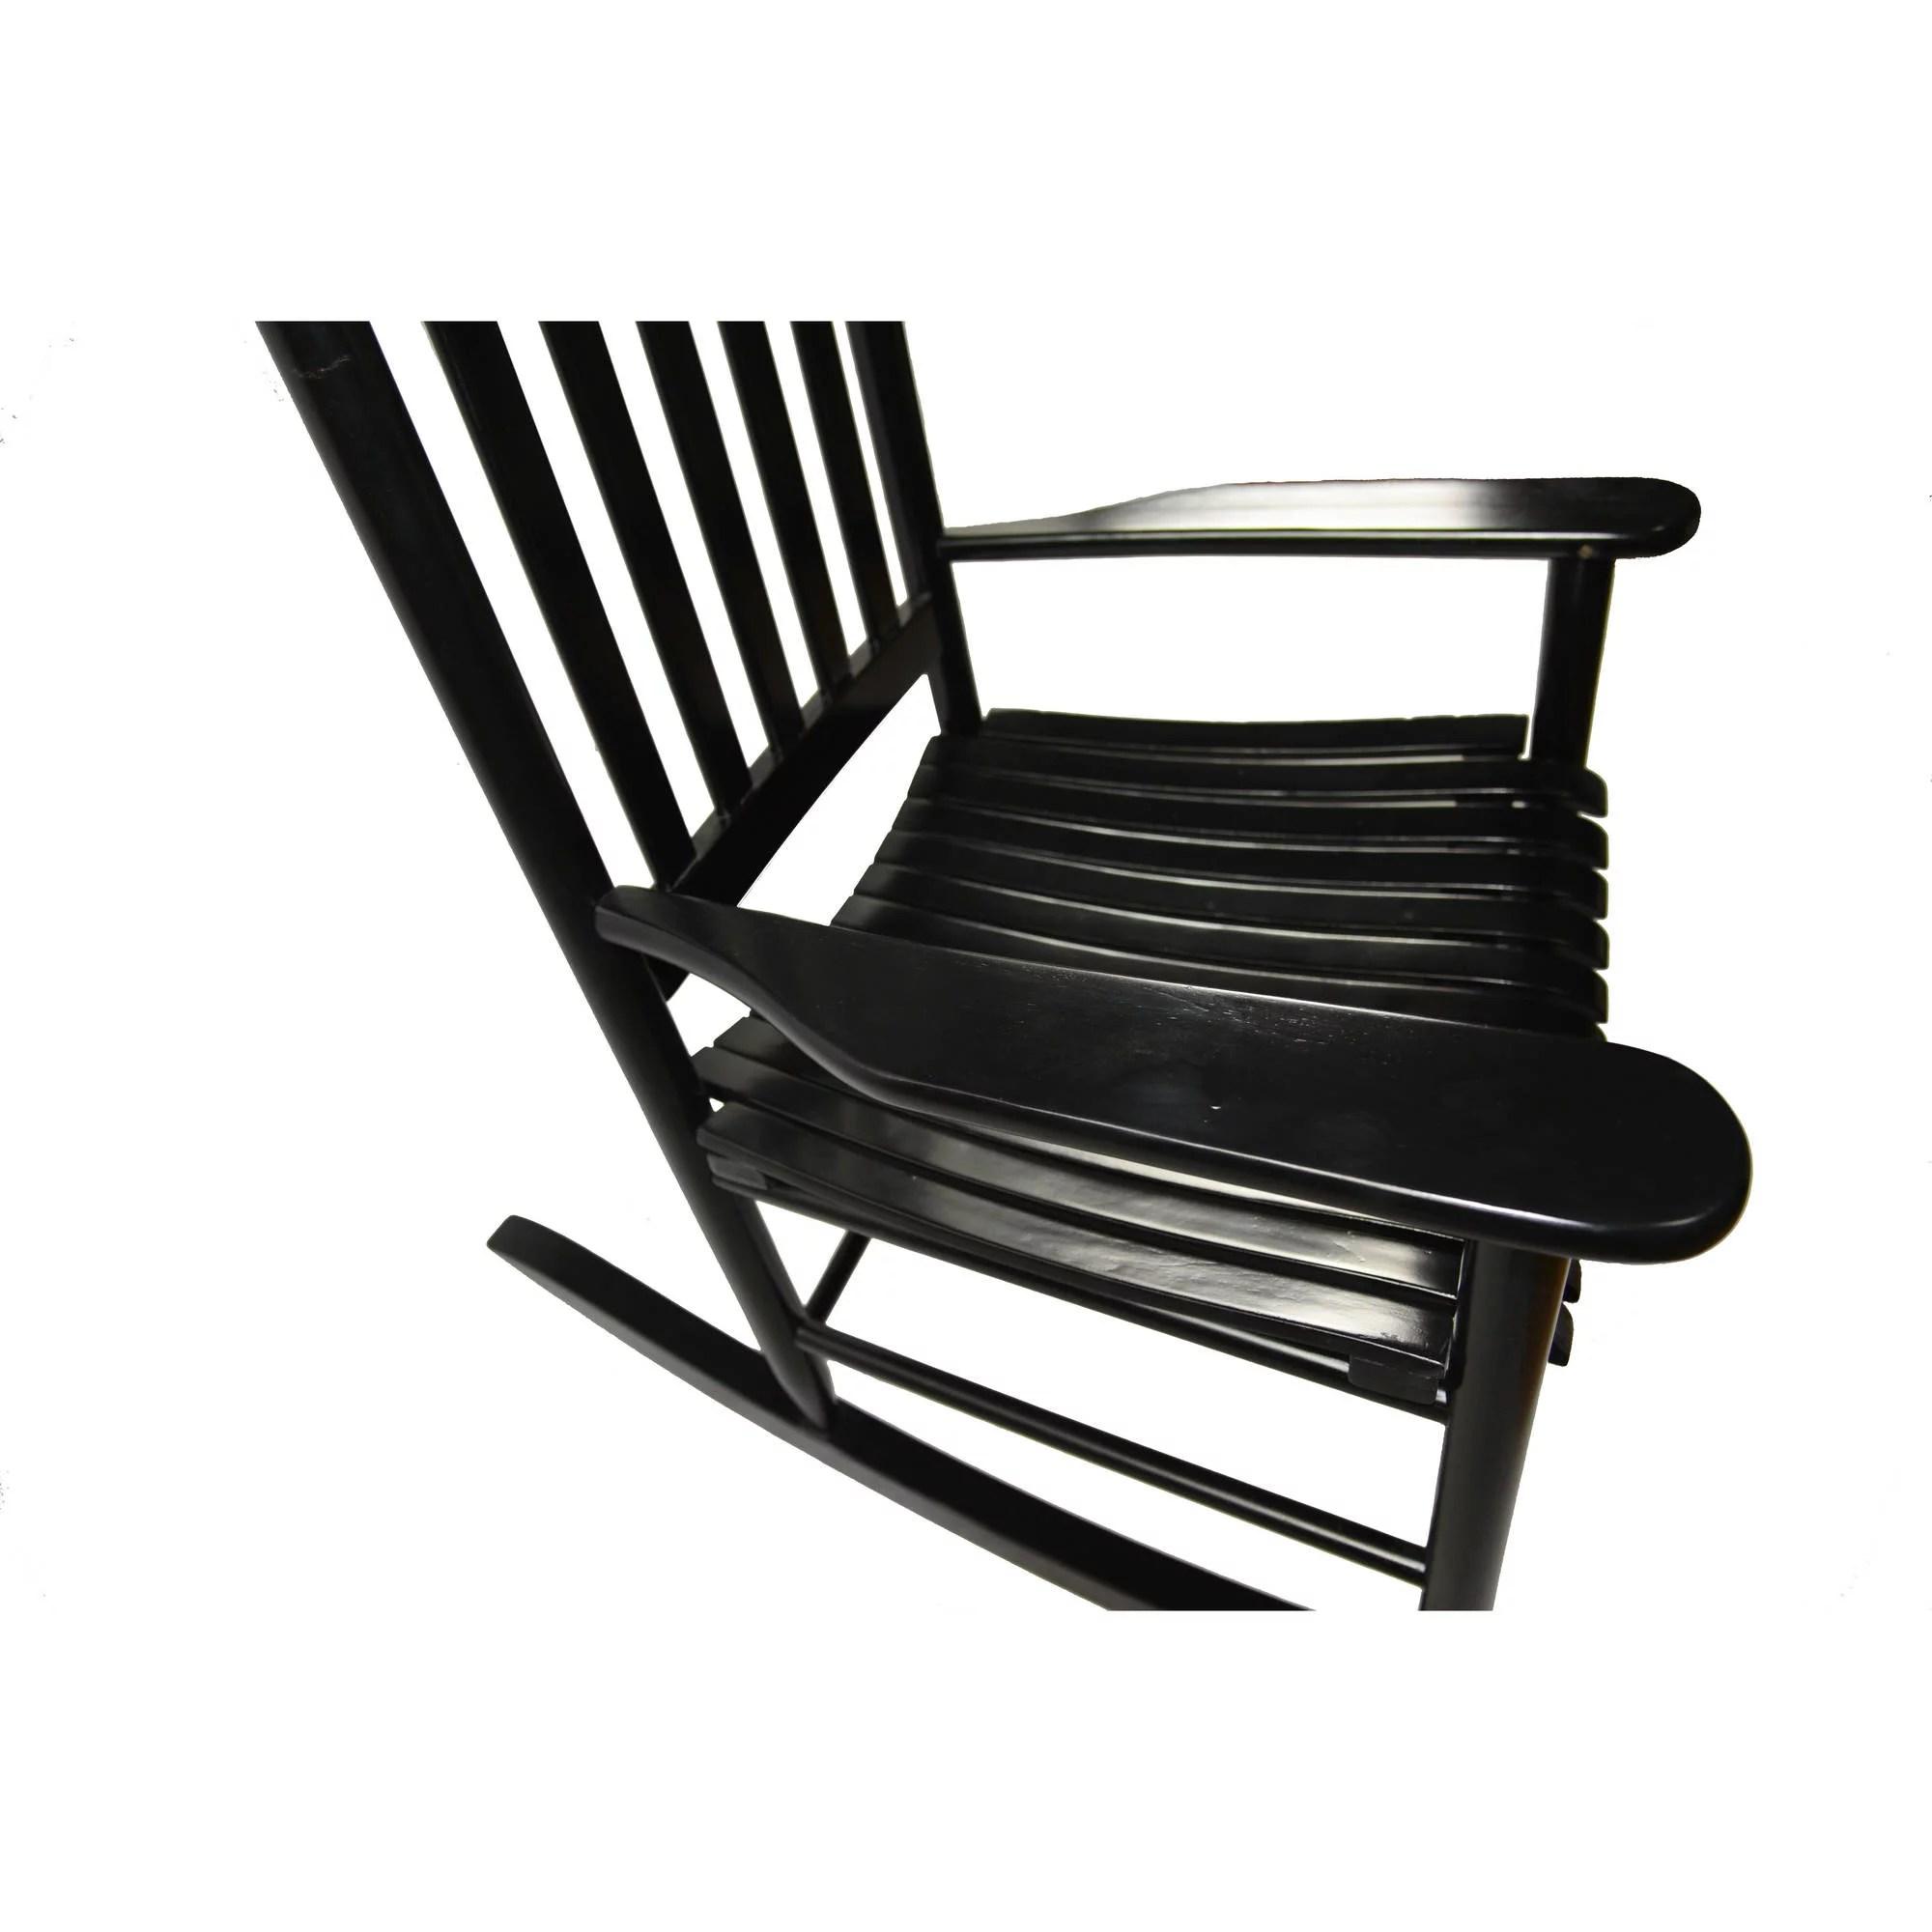 walmart outdoor rocking chair recliner chairs garden beautiful black rtty1